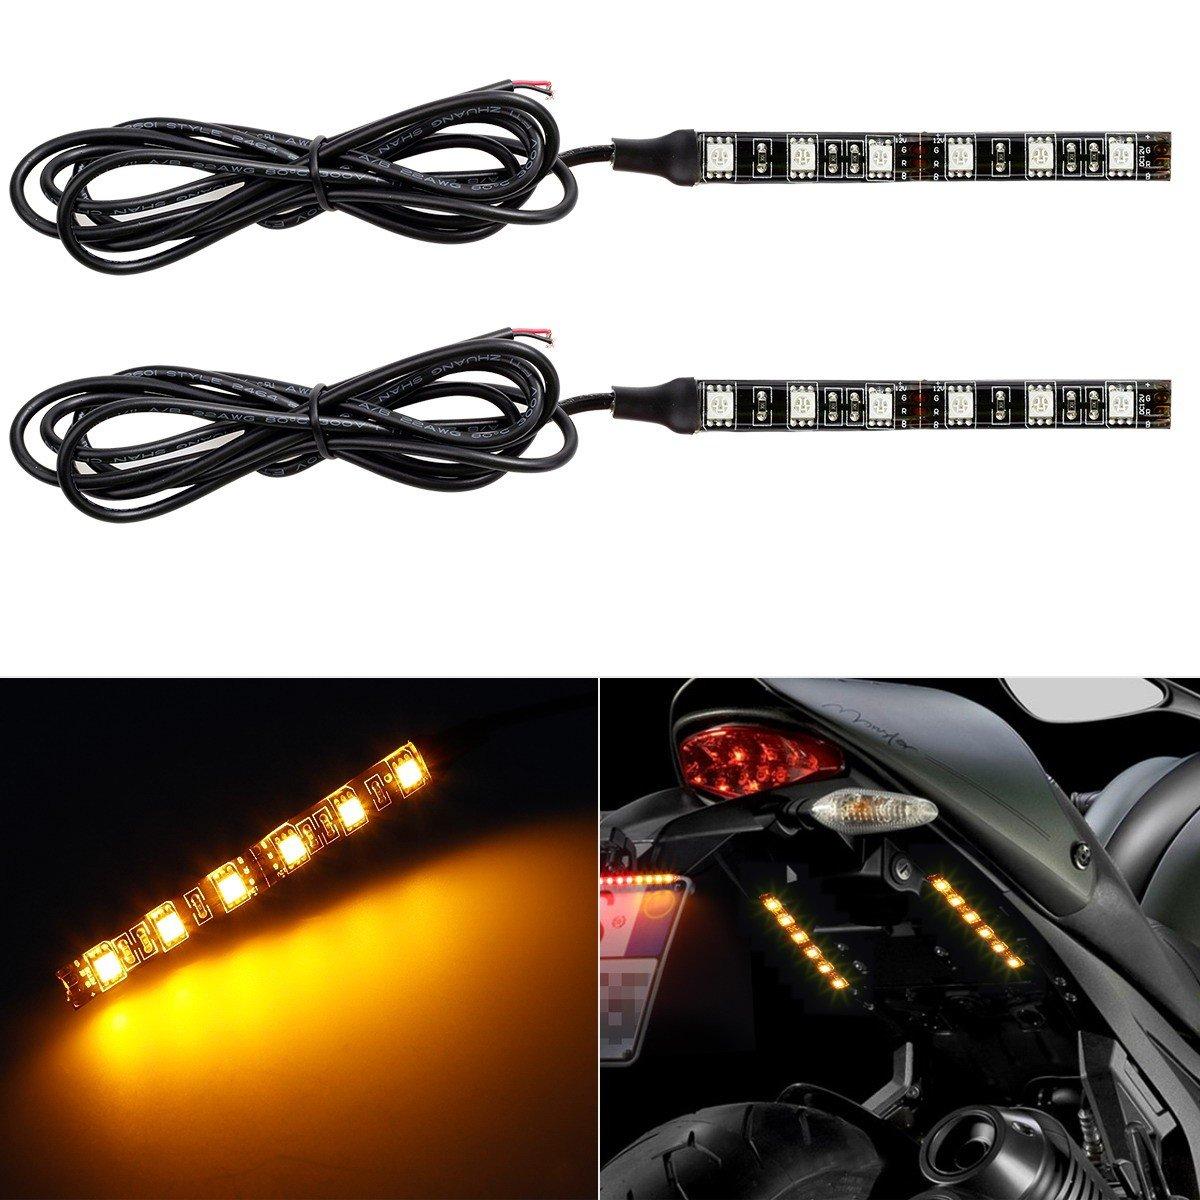 Partsam LED Strip Light Bar 2 x 6 LED Mini Black Third Brake Light Motorcycle Turn Signal Backup License Plate Universal Amber Lights Strip